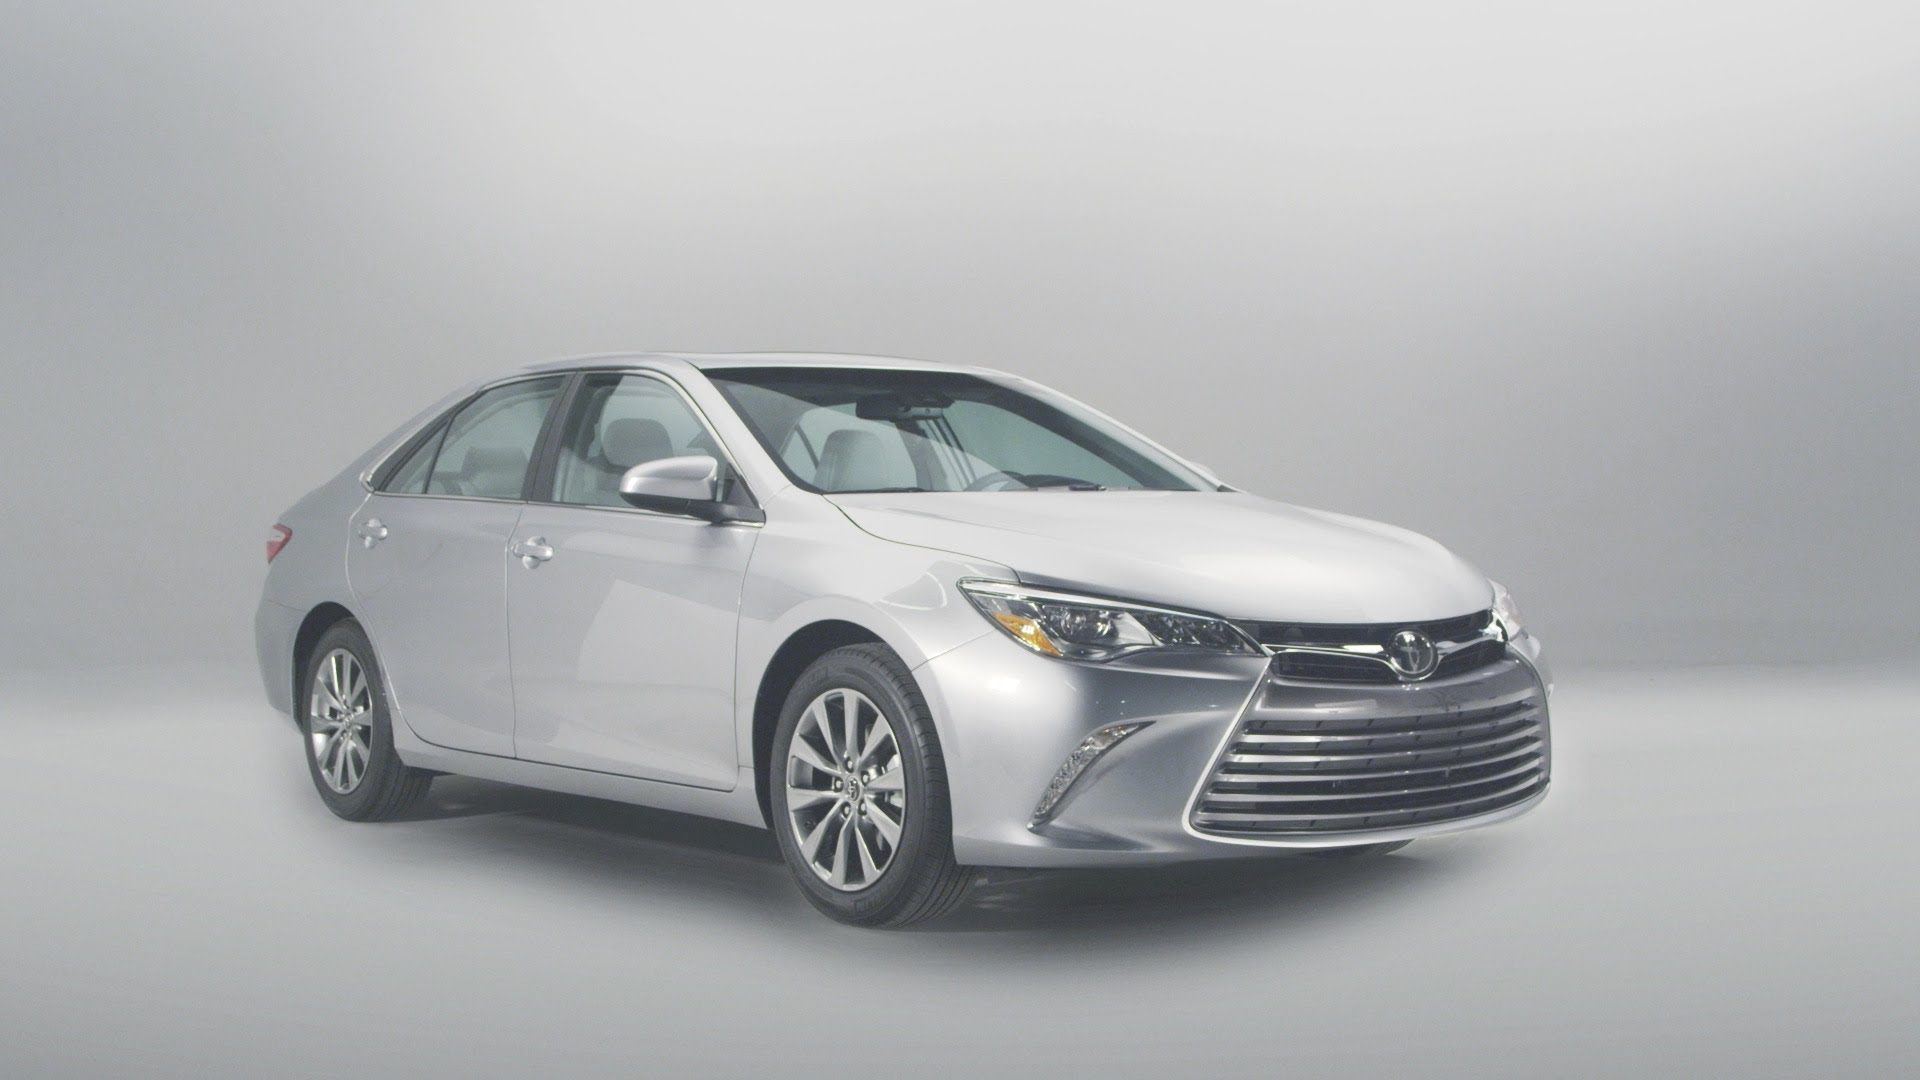 Toyota Camry Hybrid green car